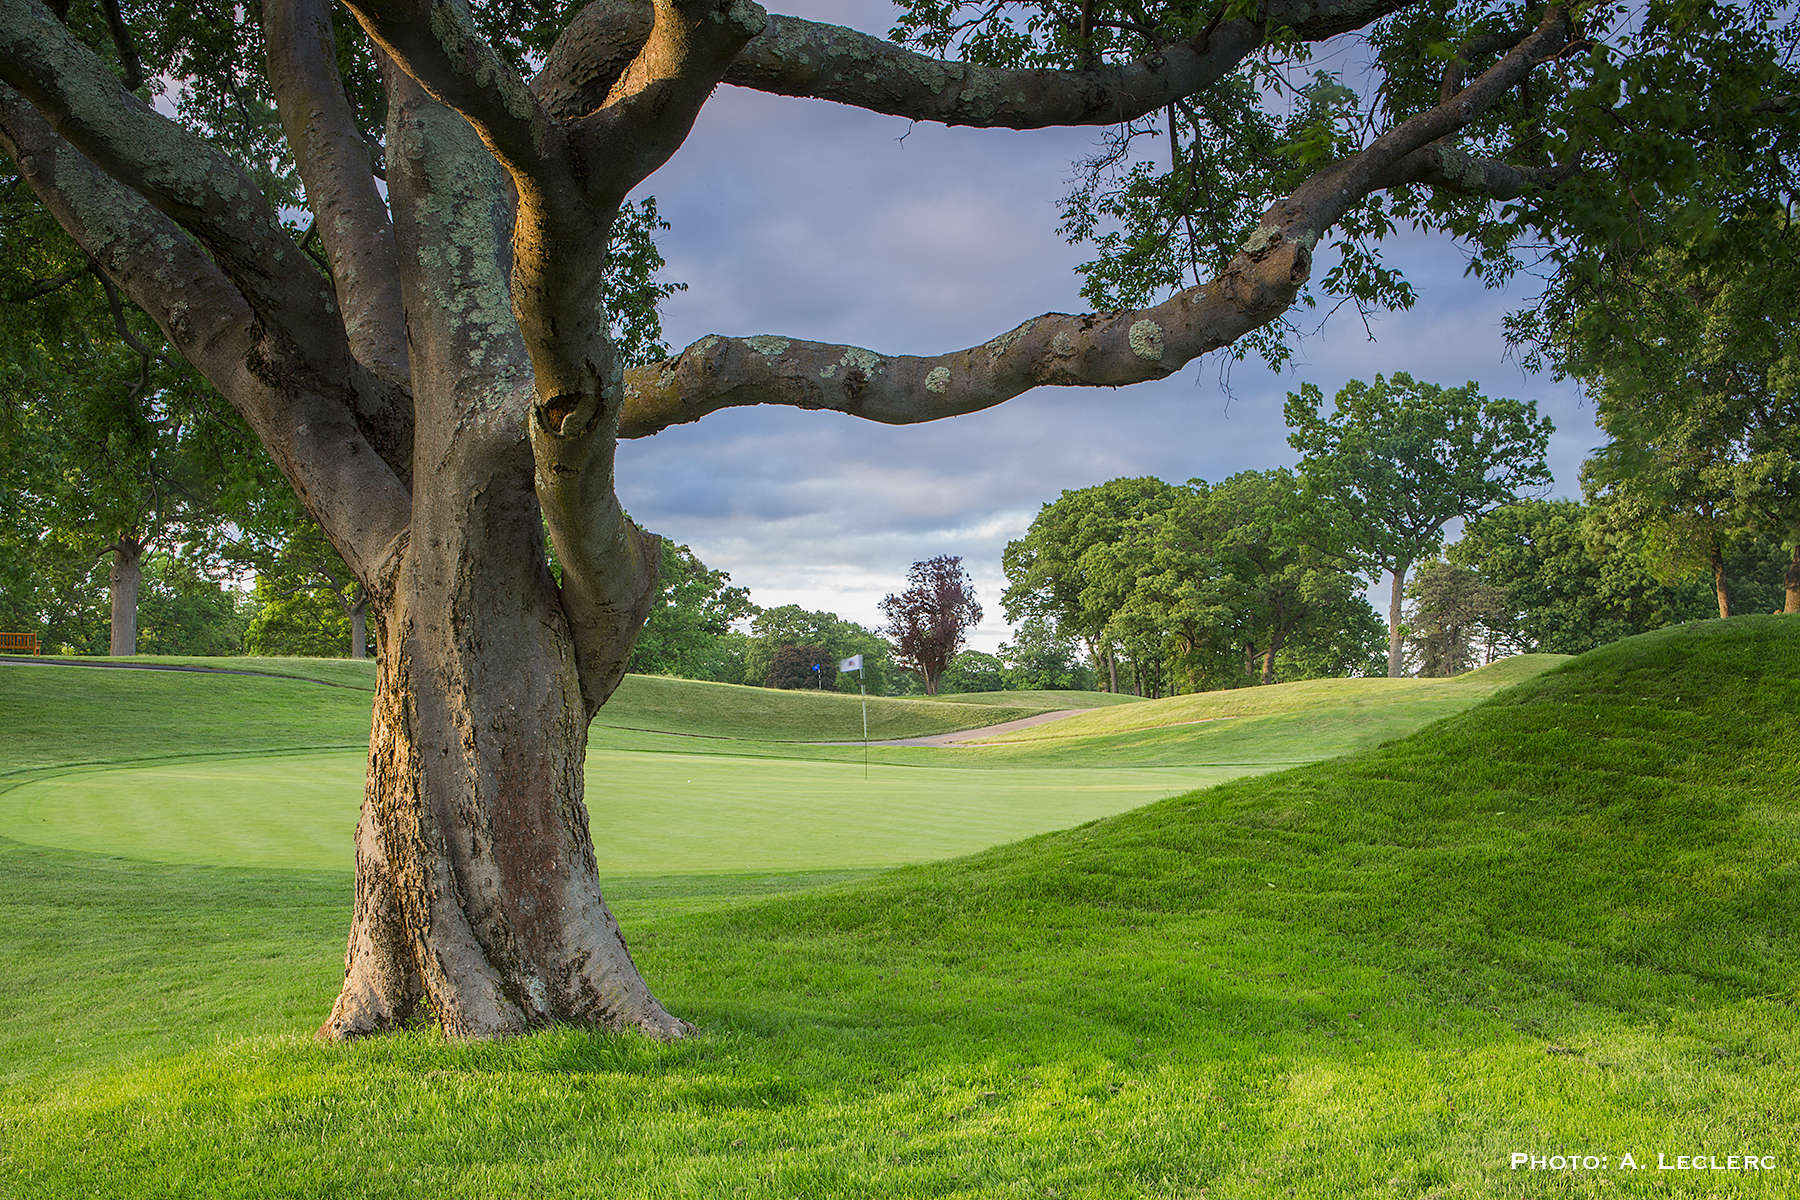 AaronLeclerc_GolfCourses_51